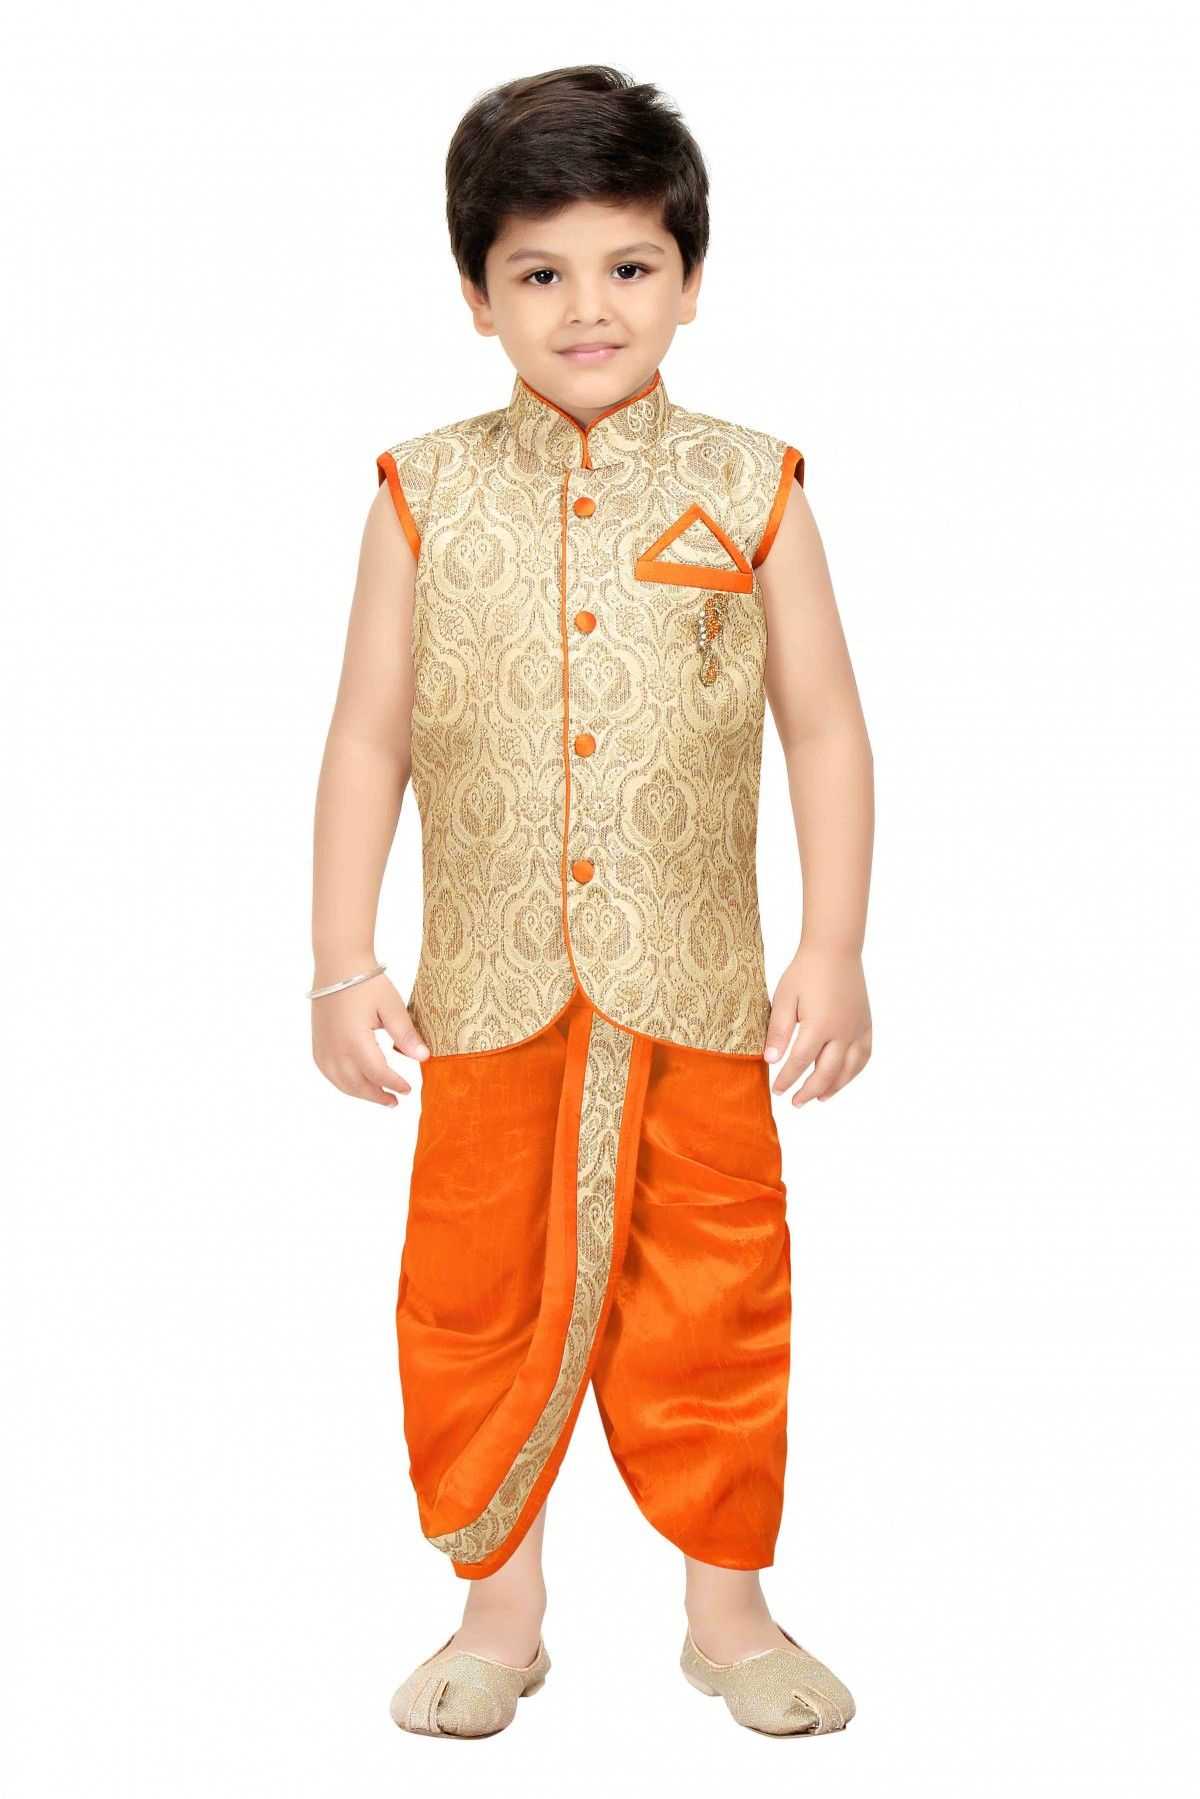 a1870608d106 Cotton Blend Party Wear Dhoti Kurta Set in Orange Colour